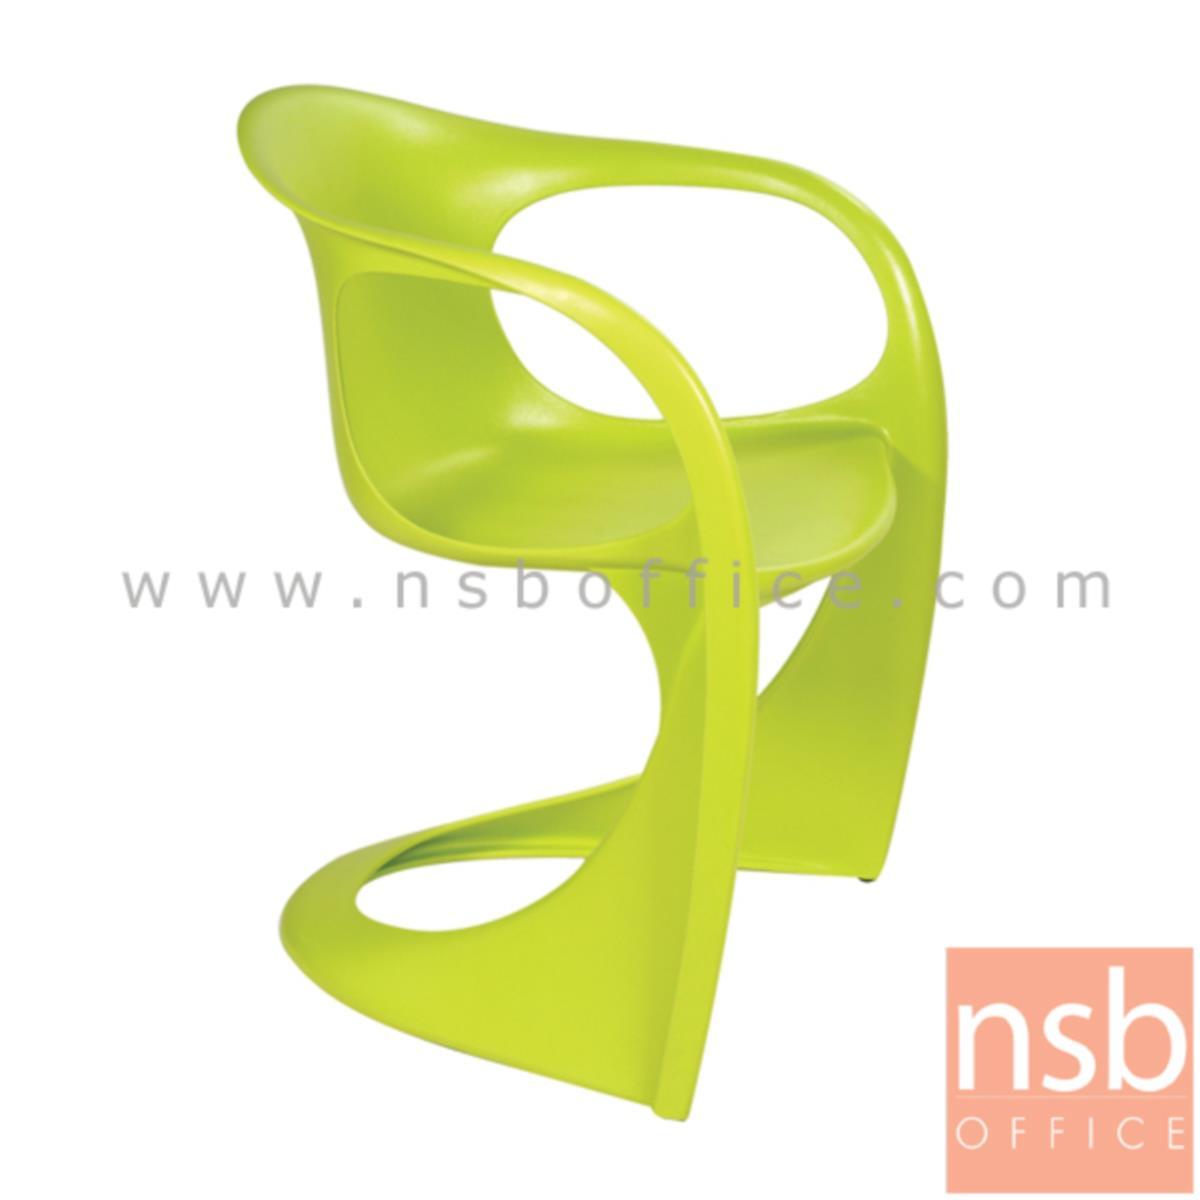 B29A041:เก้าอี้โมเดิร์นพลาสติก(ABS) รุ่น PP9098 ขนาด 57W cm.